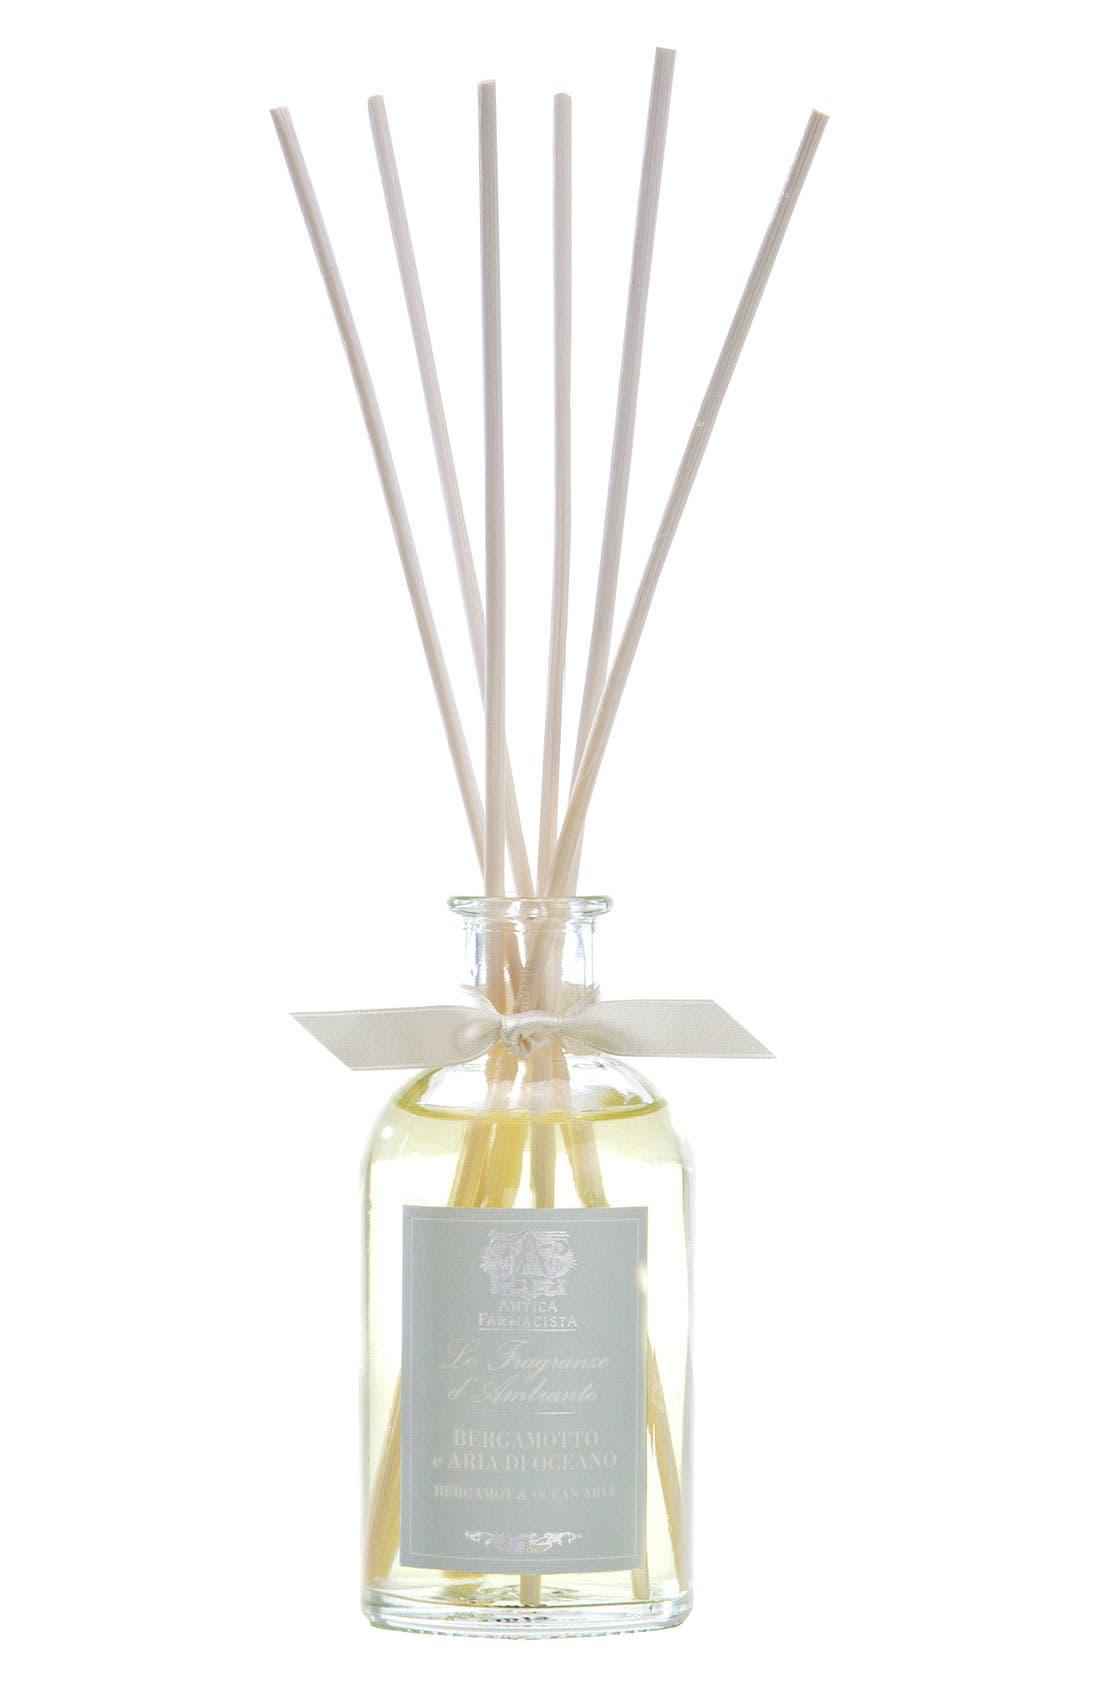 Main Image - Antica Farmacista Bergamot & Ocean Aria Home Ambiance Perfume (3.3 oz.)